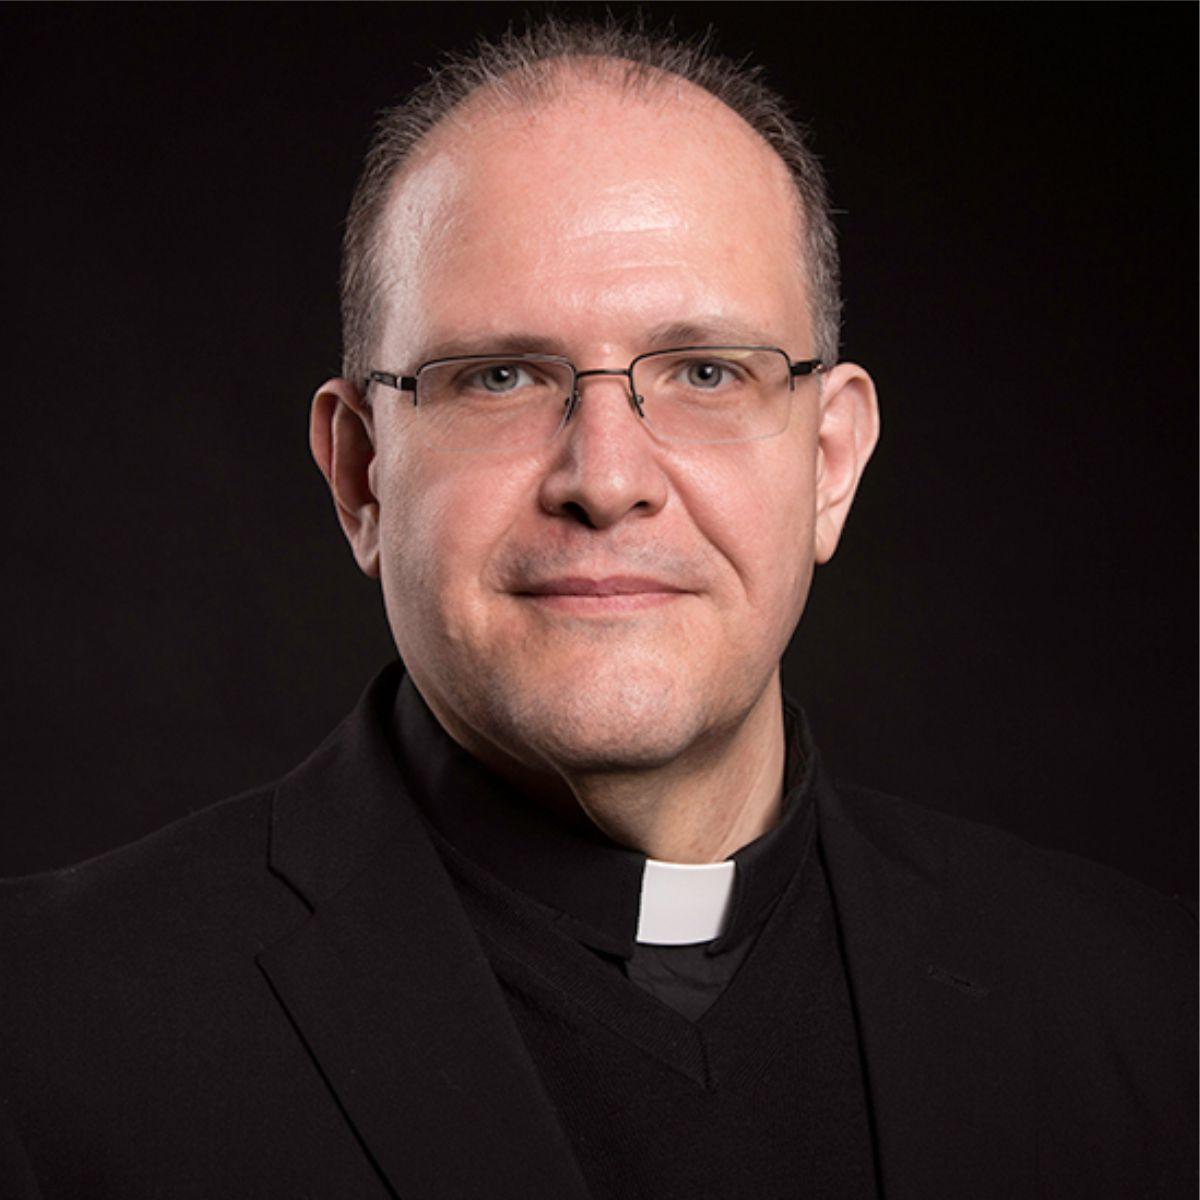 Fr Camilleri